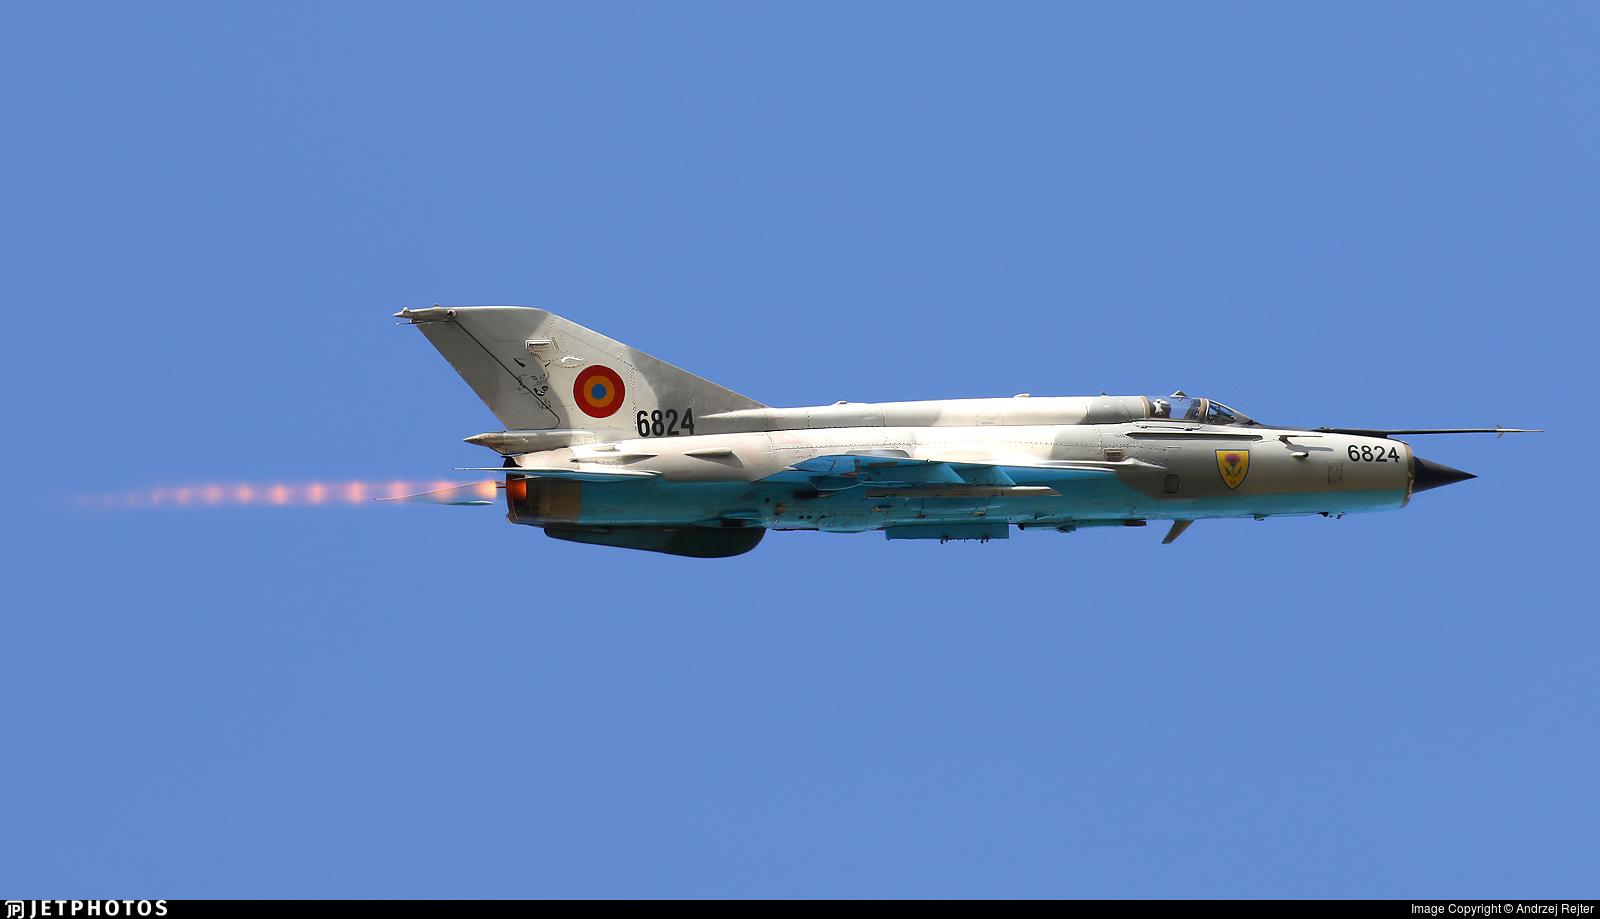 6824 - Mikoyan-Gurevich MiG-21MF Lancer C - Romania - Air Force